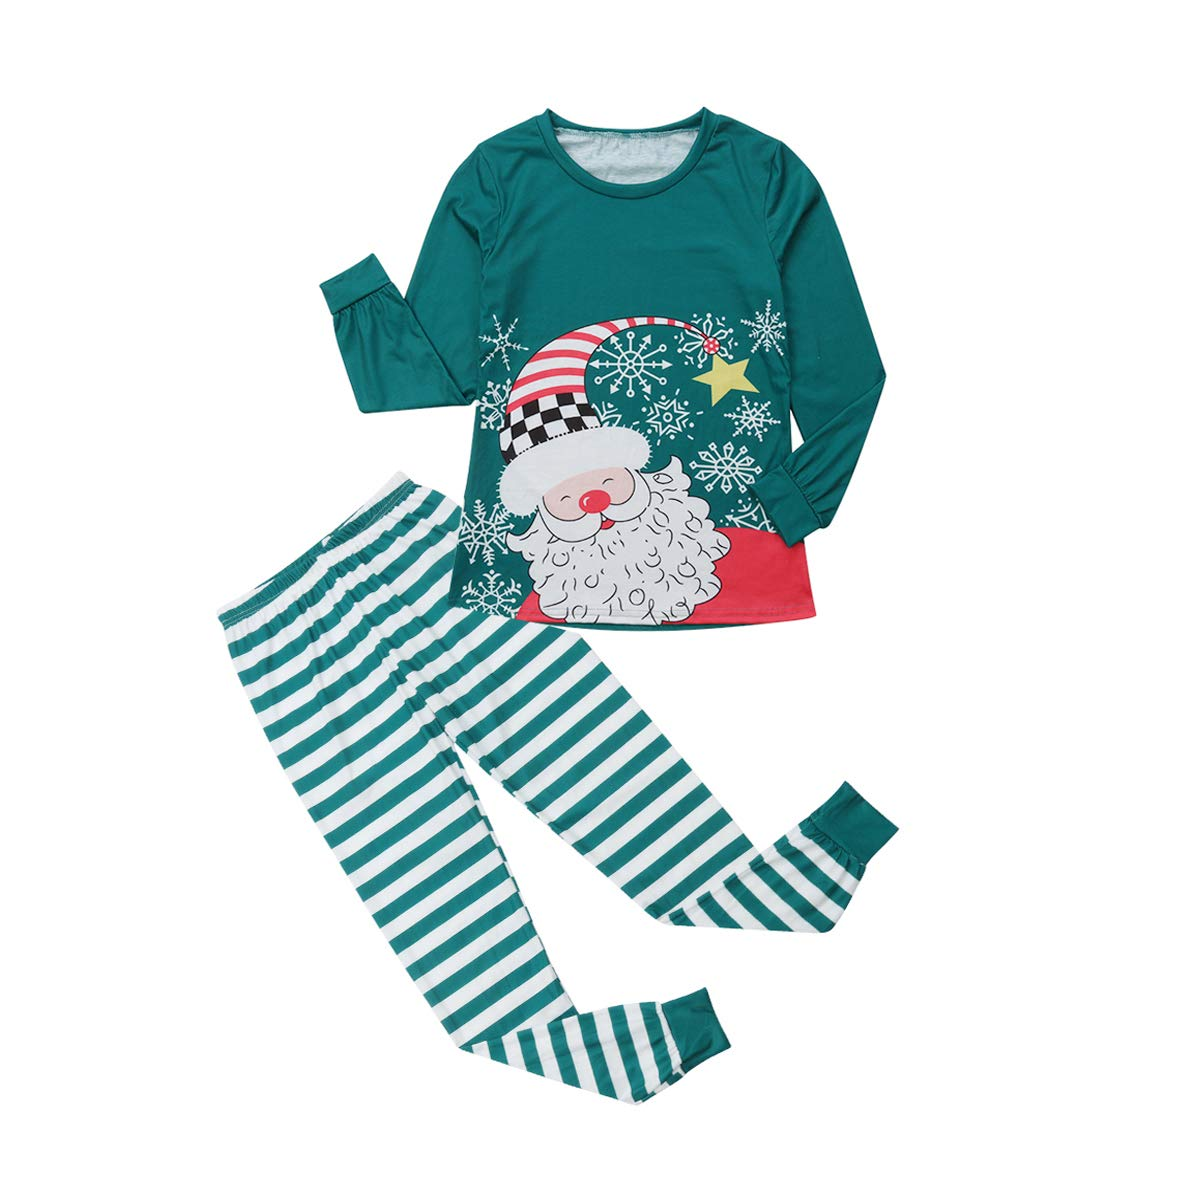 Christmas Pajamas Sets for Family Santa Claus Print Long Sleeve Top Stripe Pants 2Pcs Sleepwear Sets